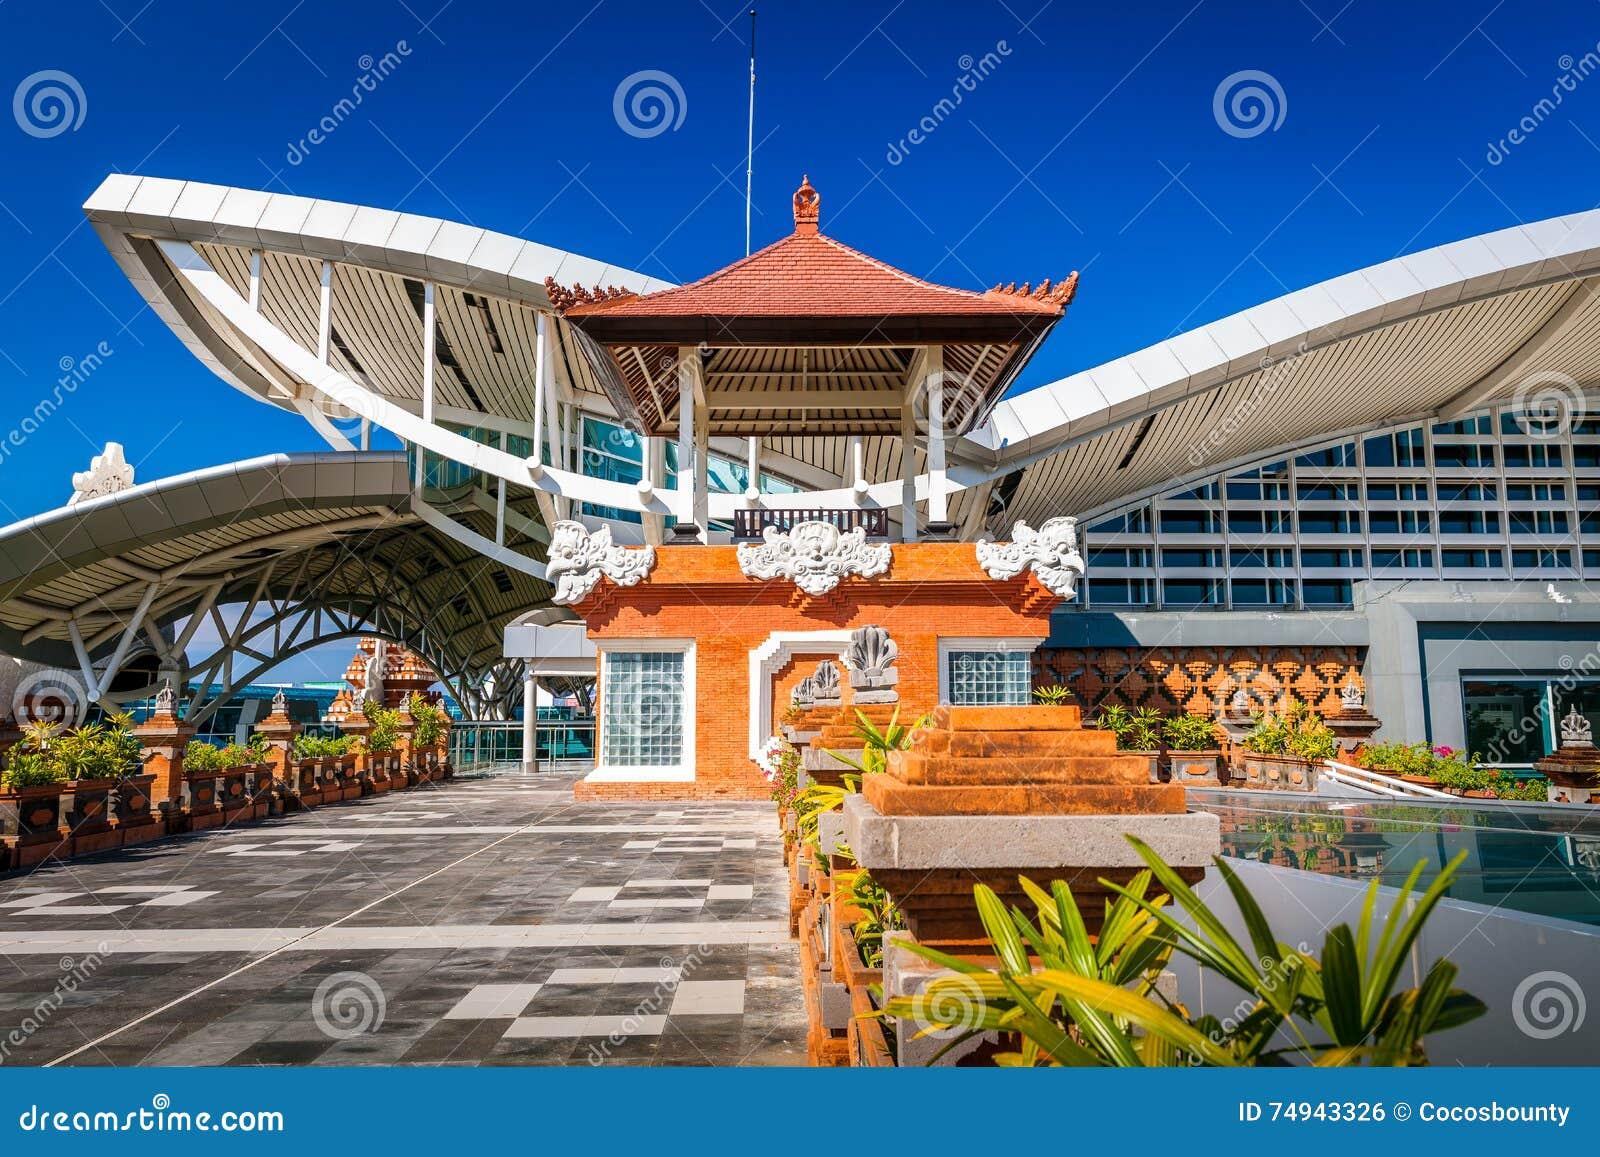 Aeroporto Bali : Bali aéroport international de denpasar sur l île tropicale bali